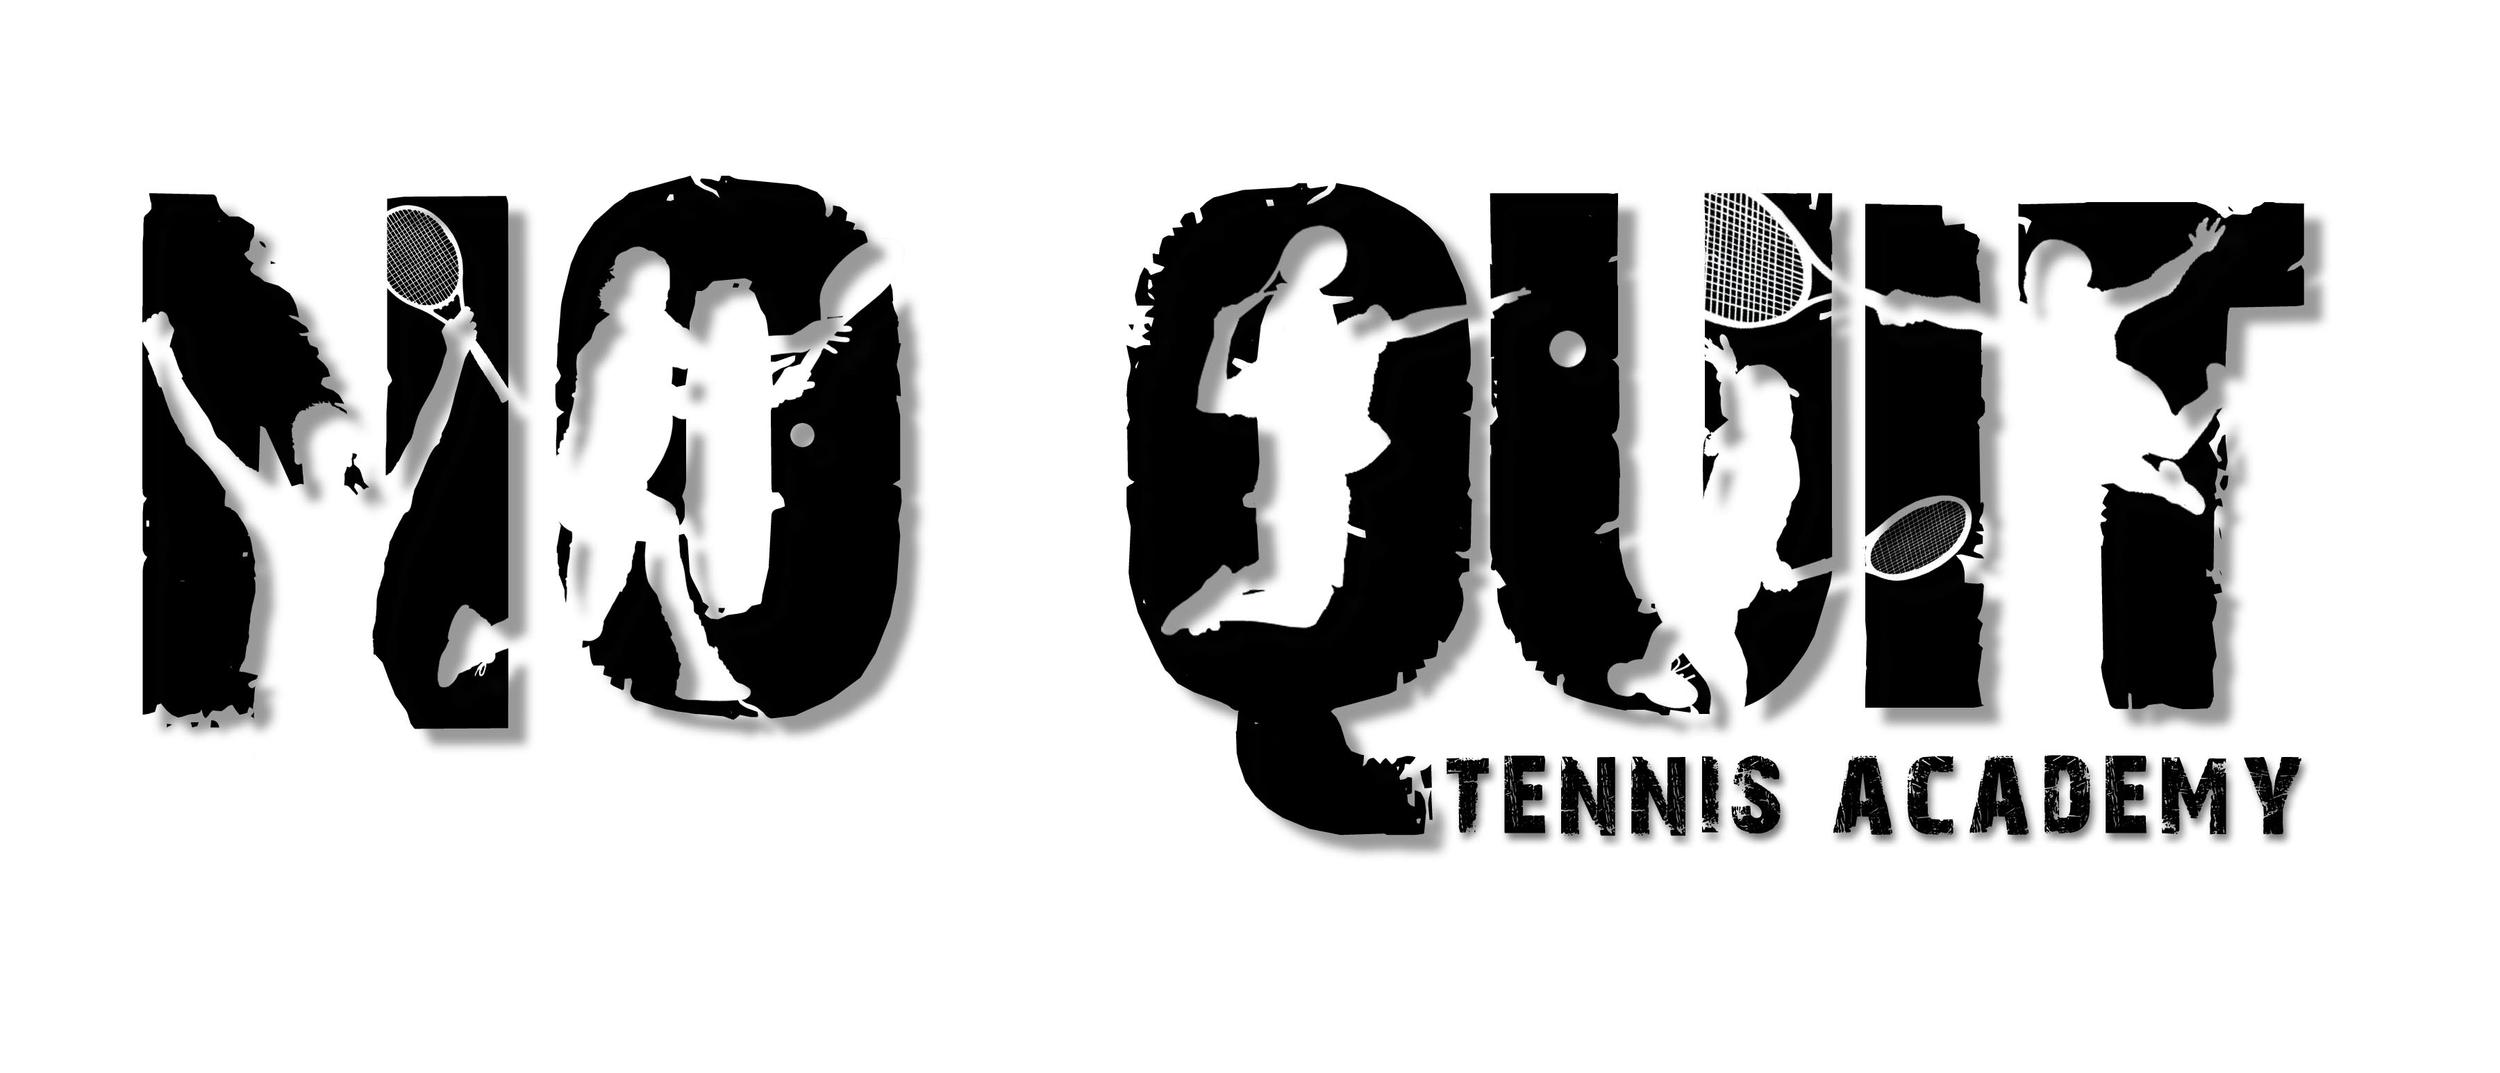 No Quit logo_white.JPG